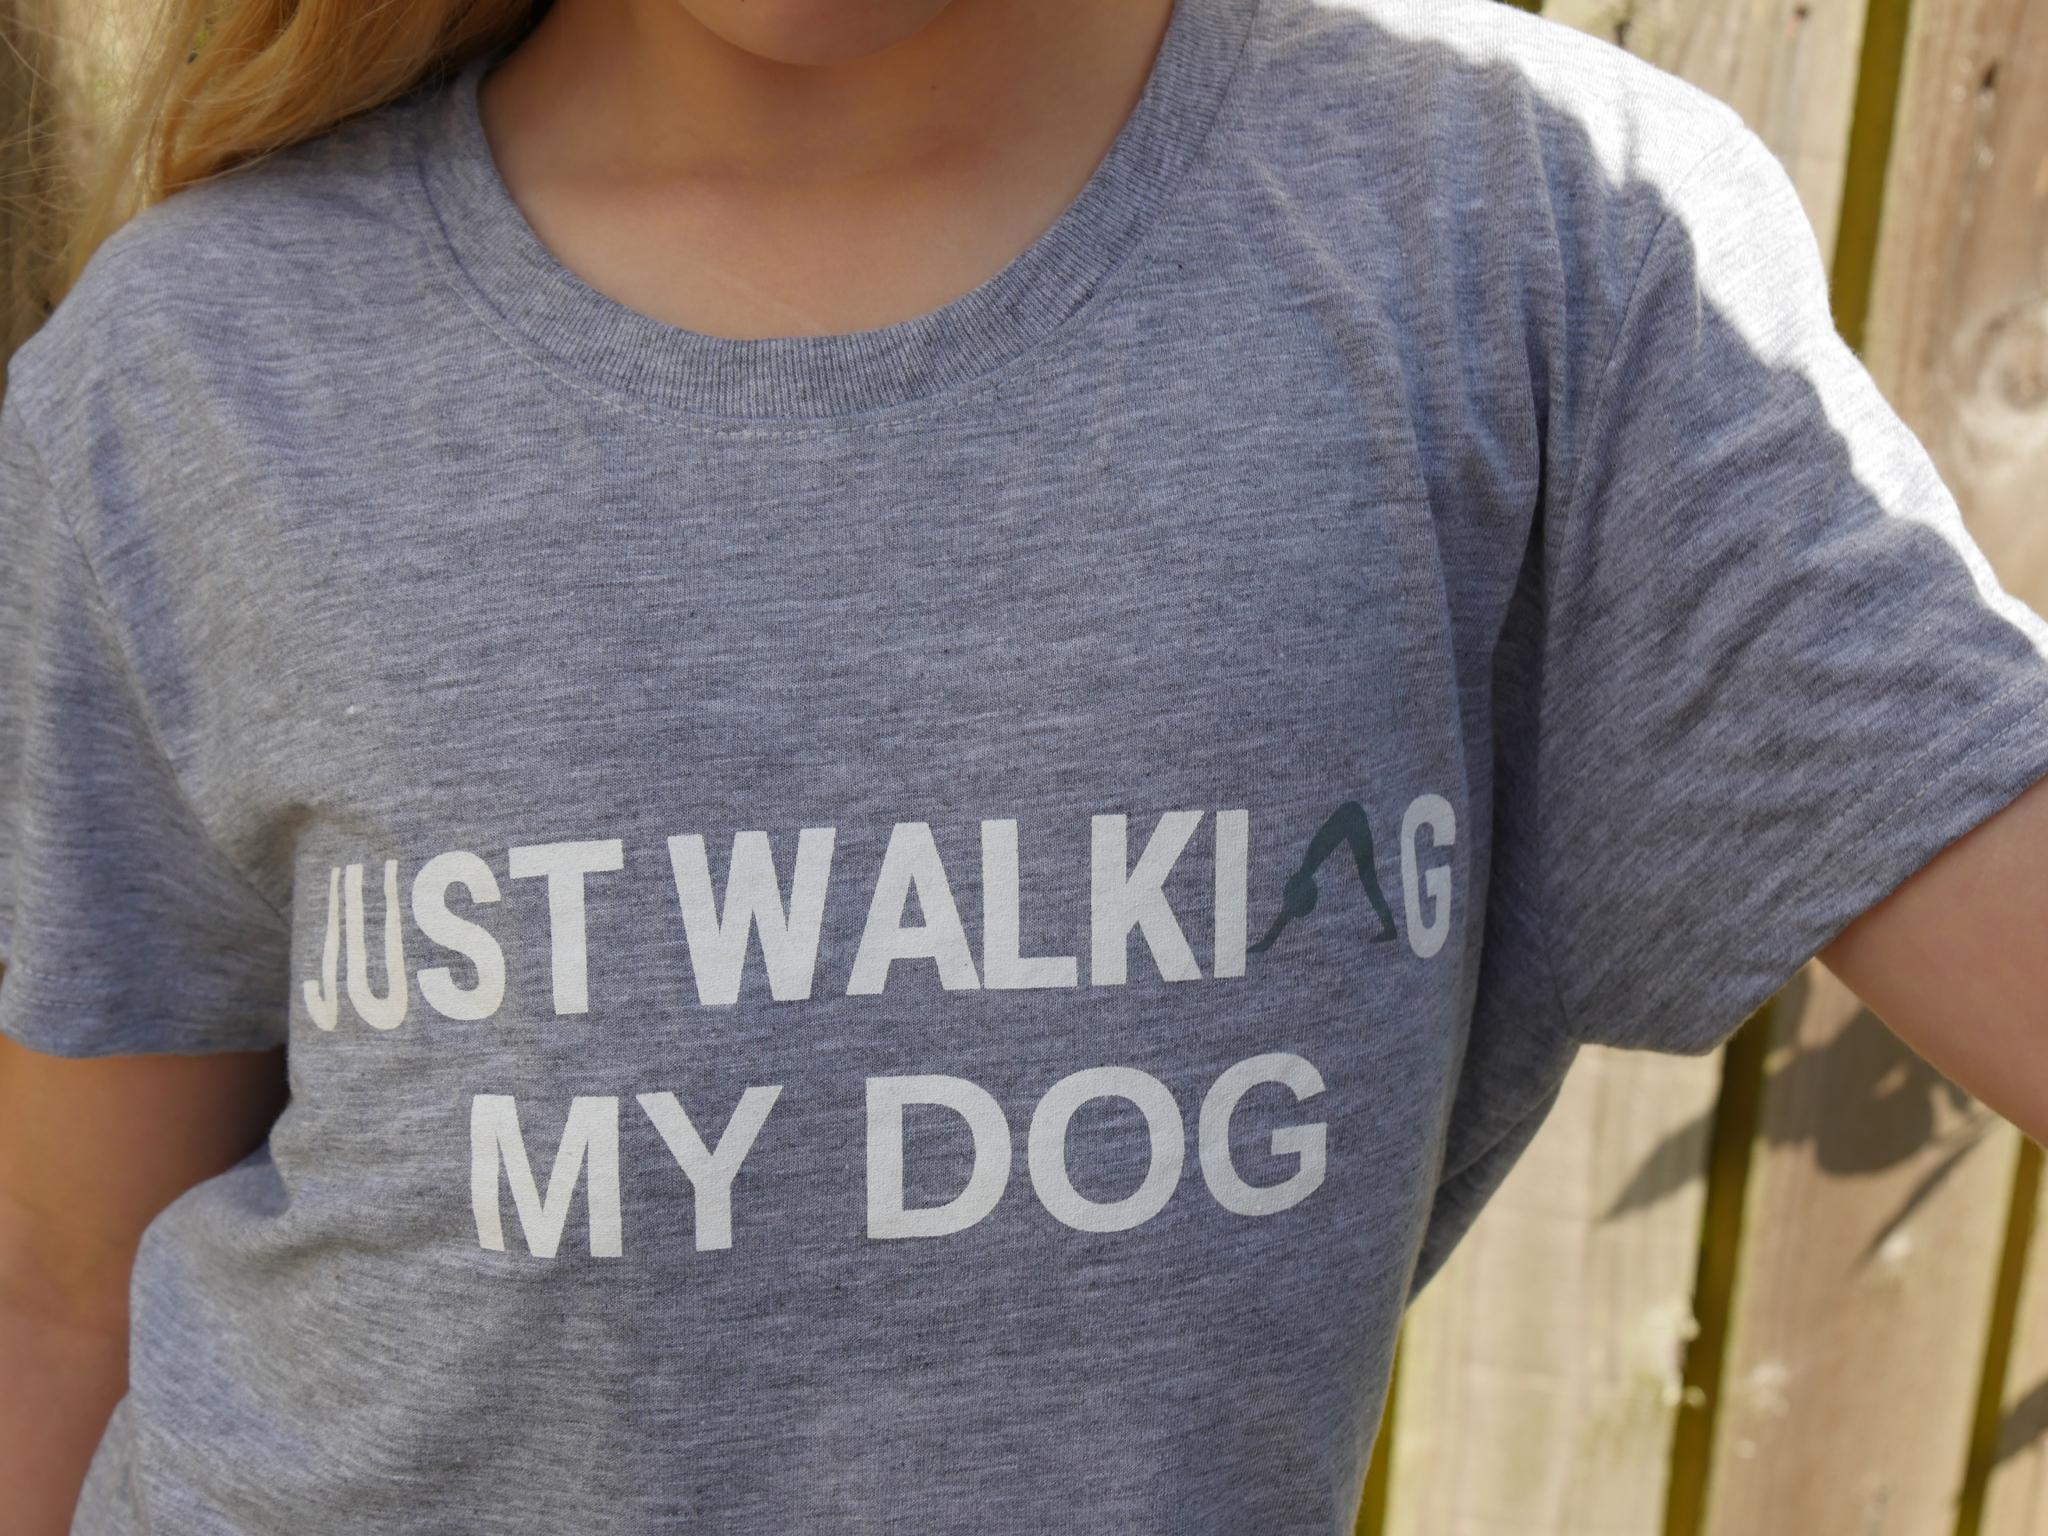 Just Walking my dog